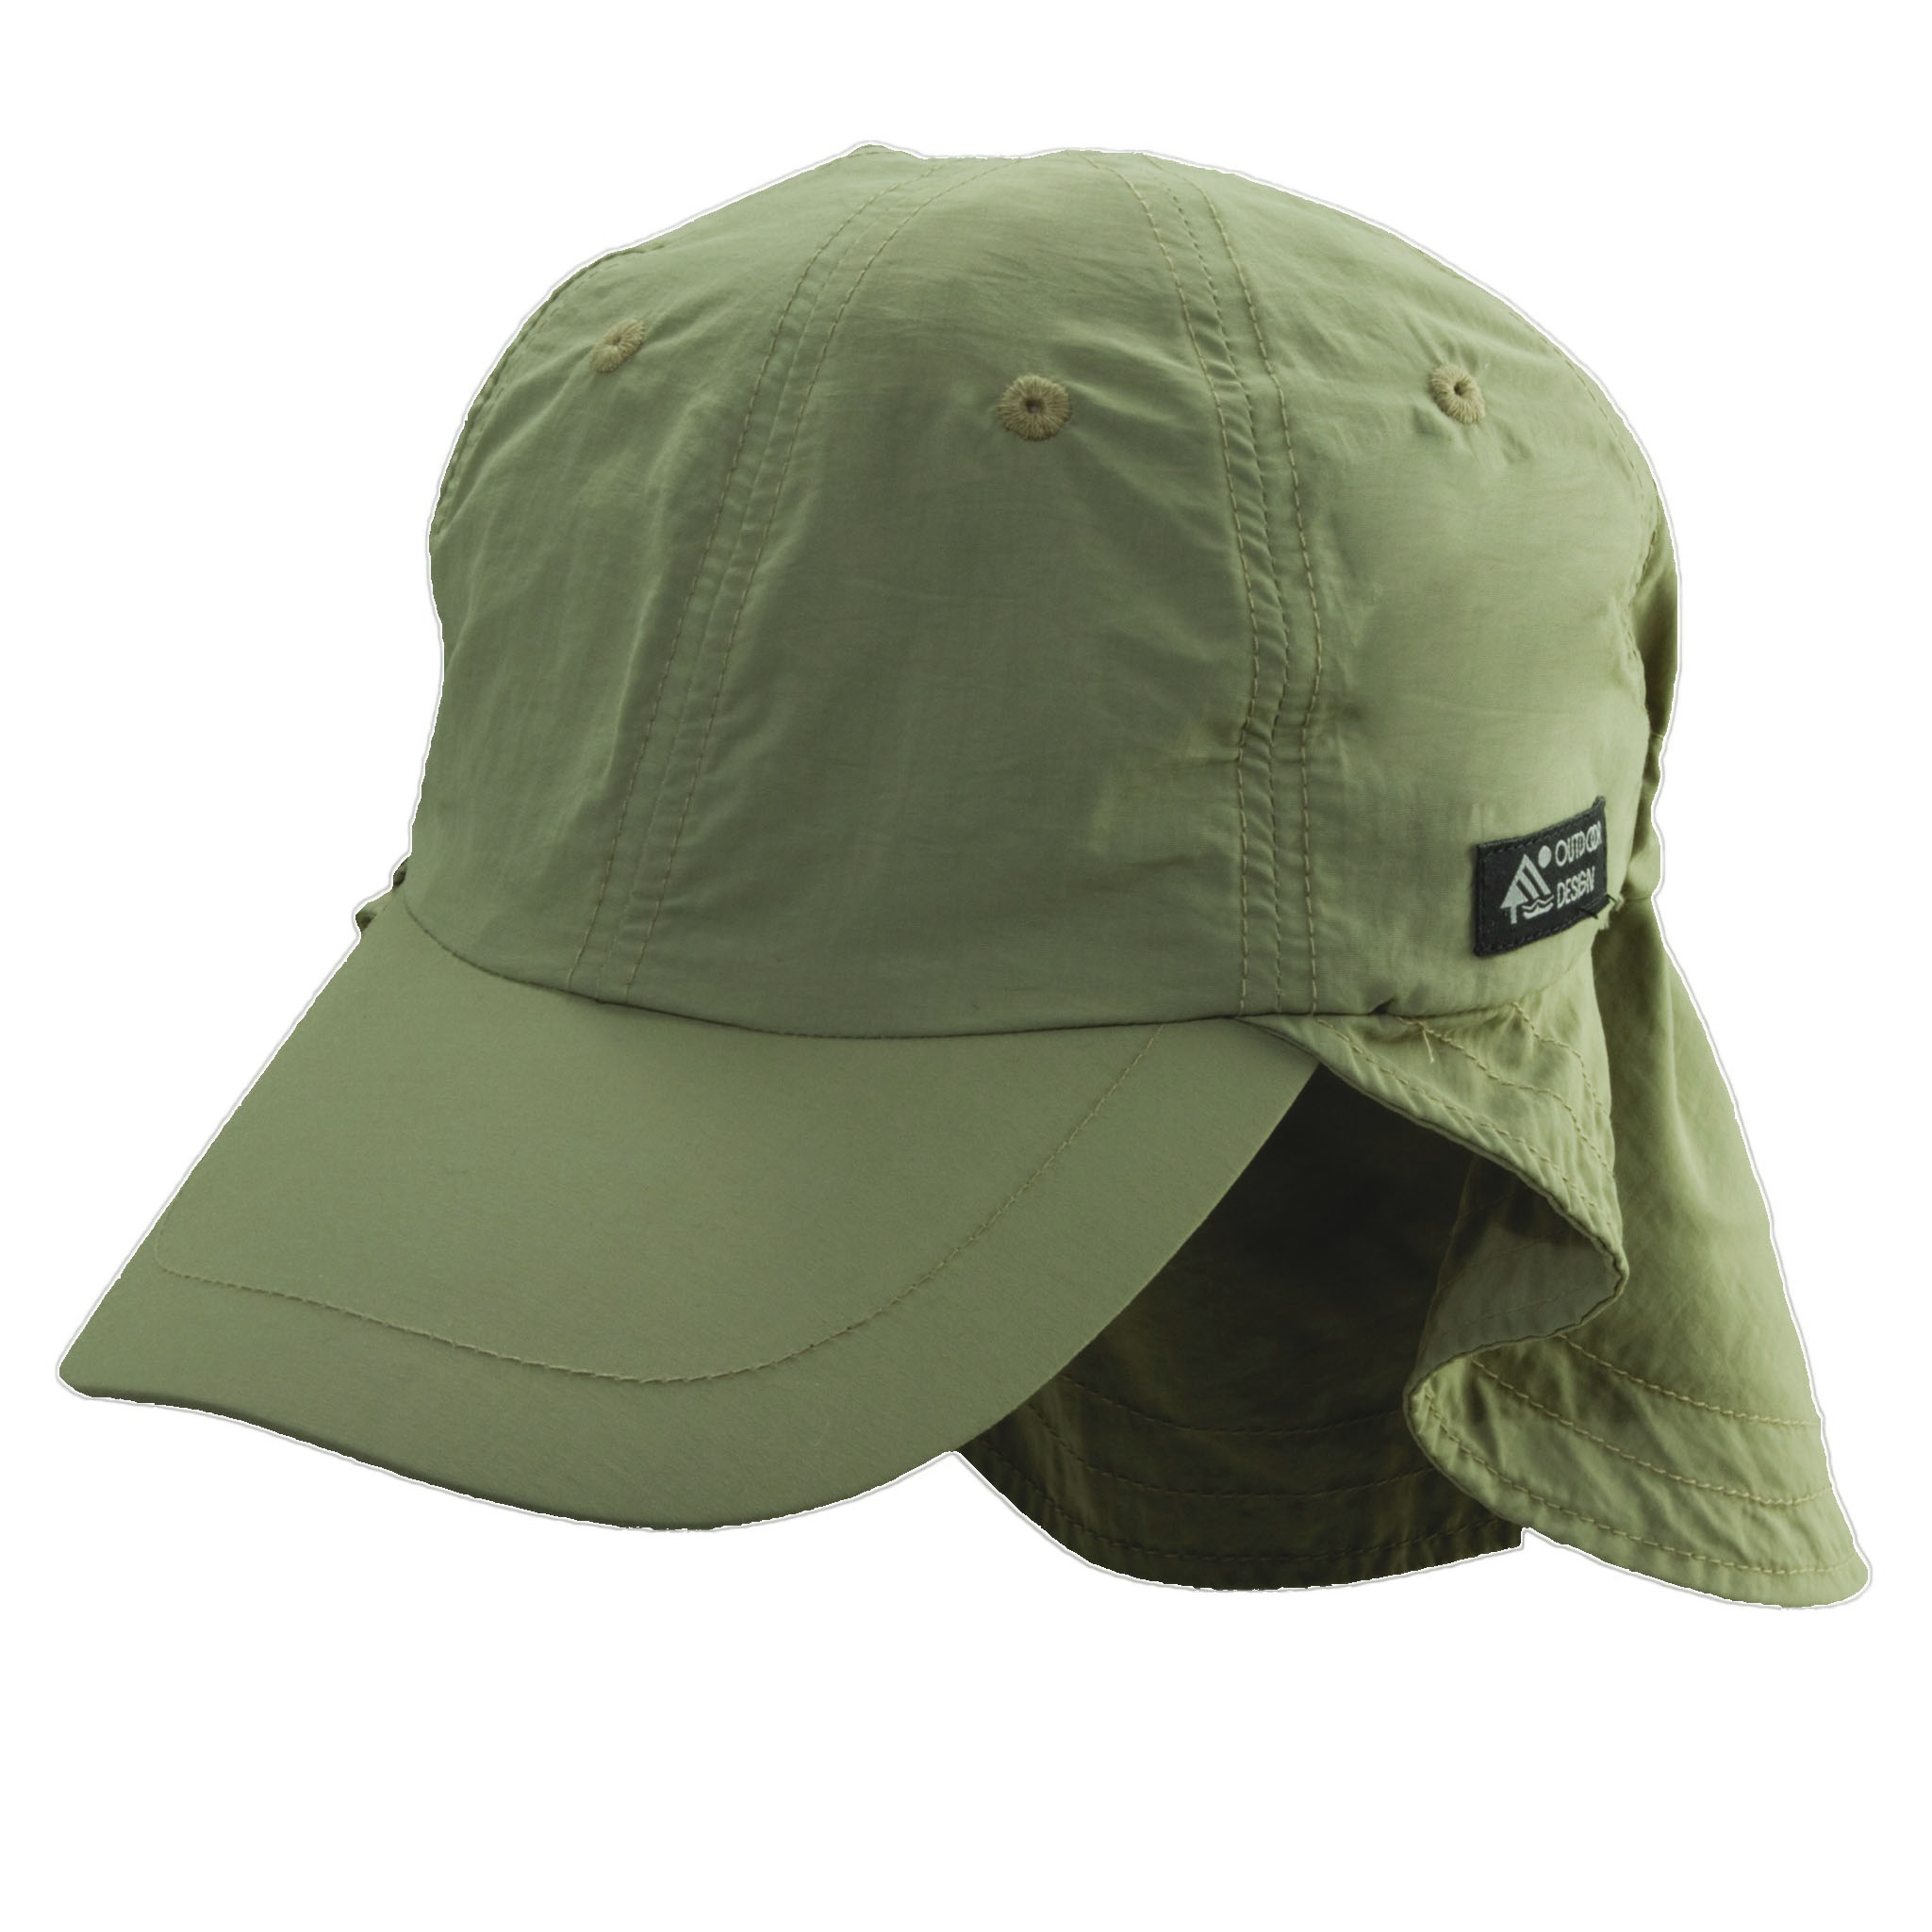 11c1584d14173 Supplex Nylon Fishing Cap